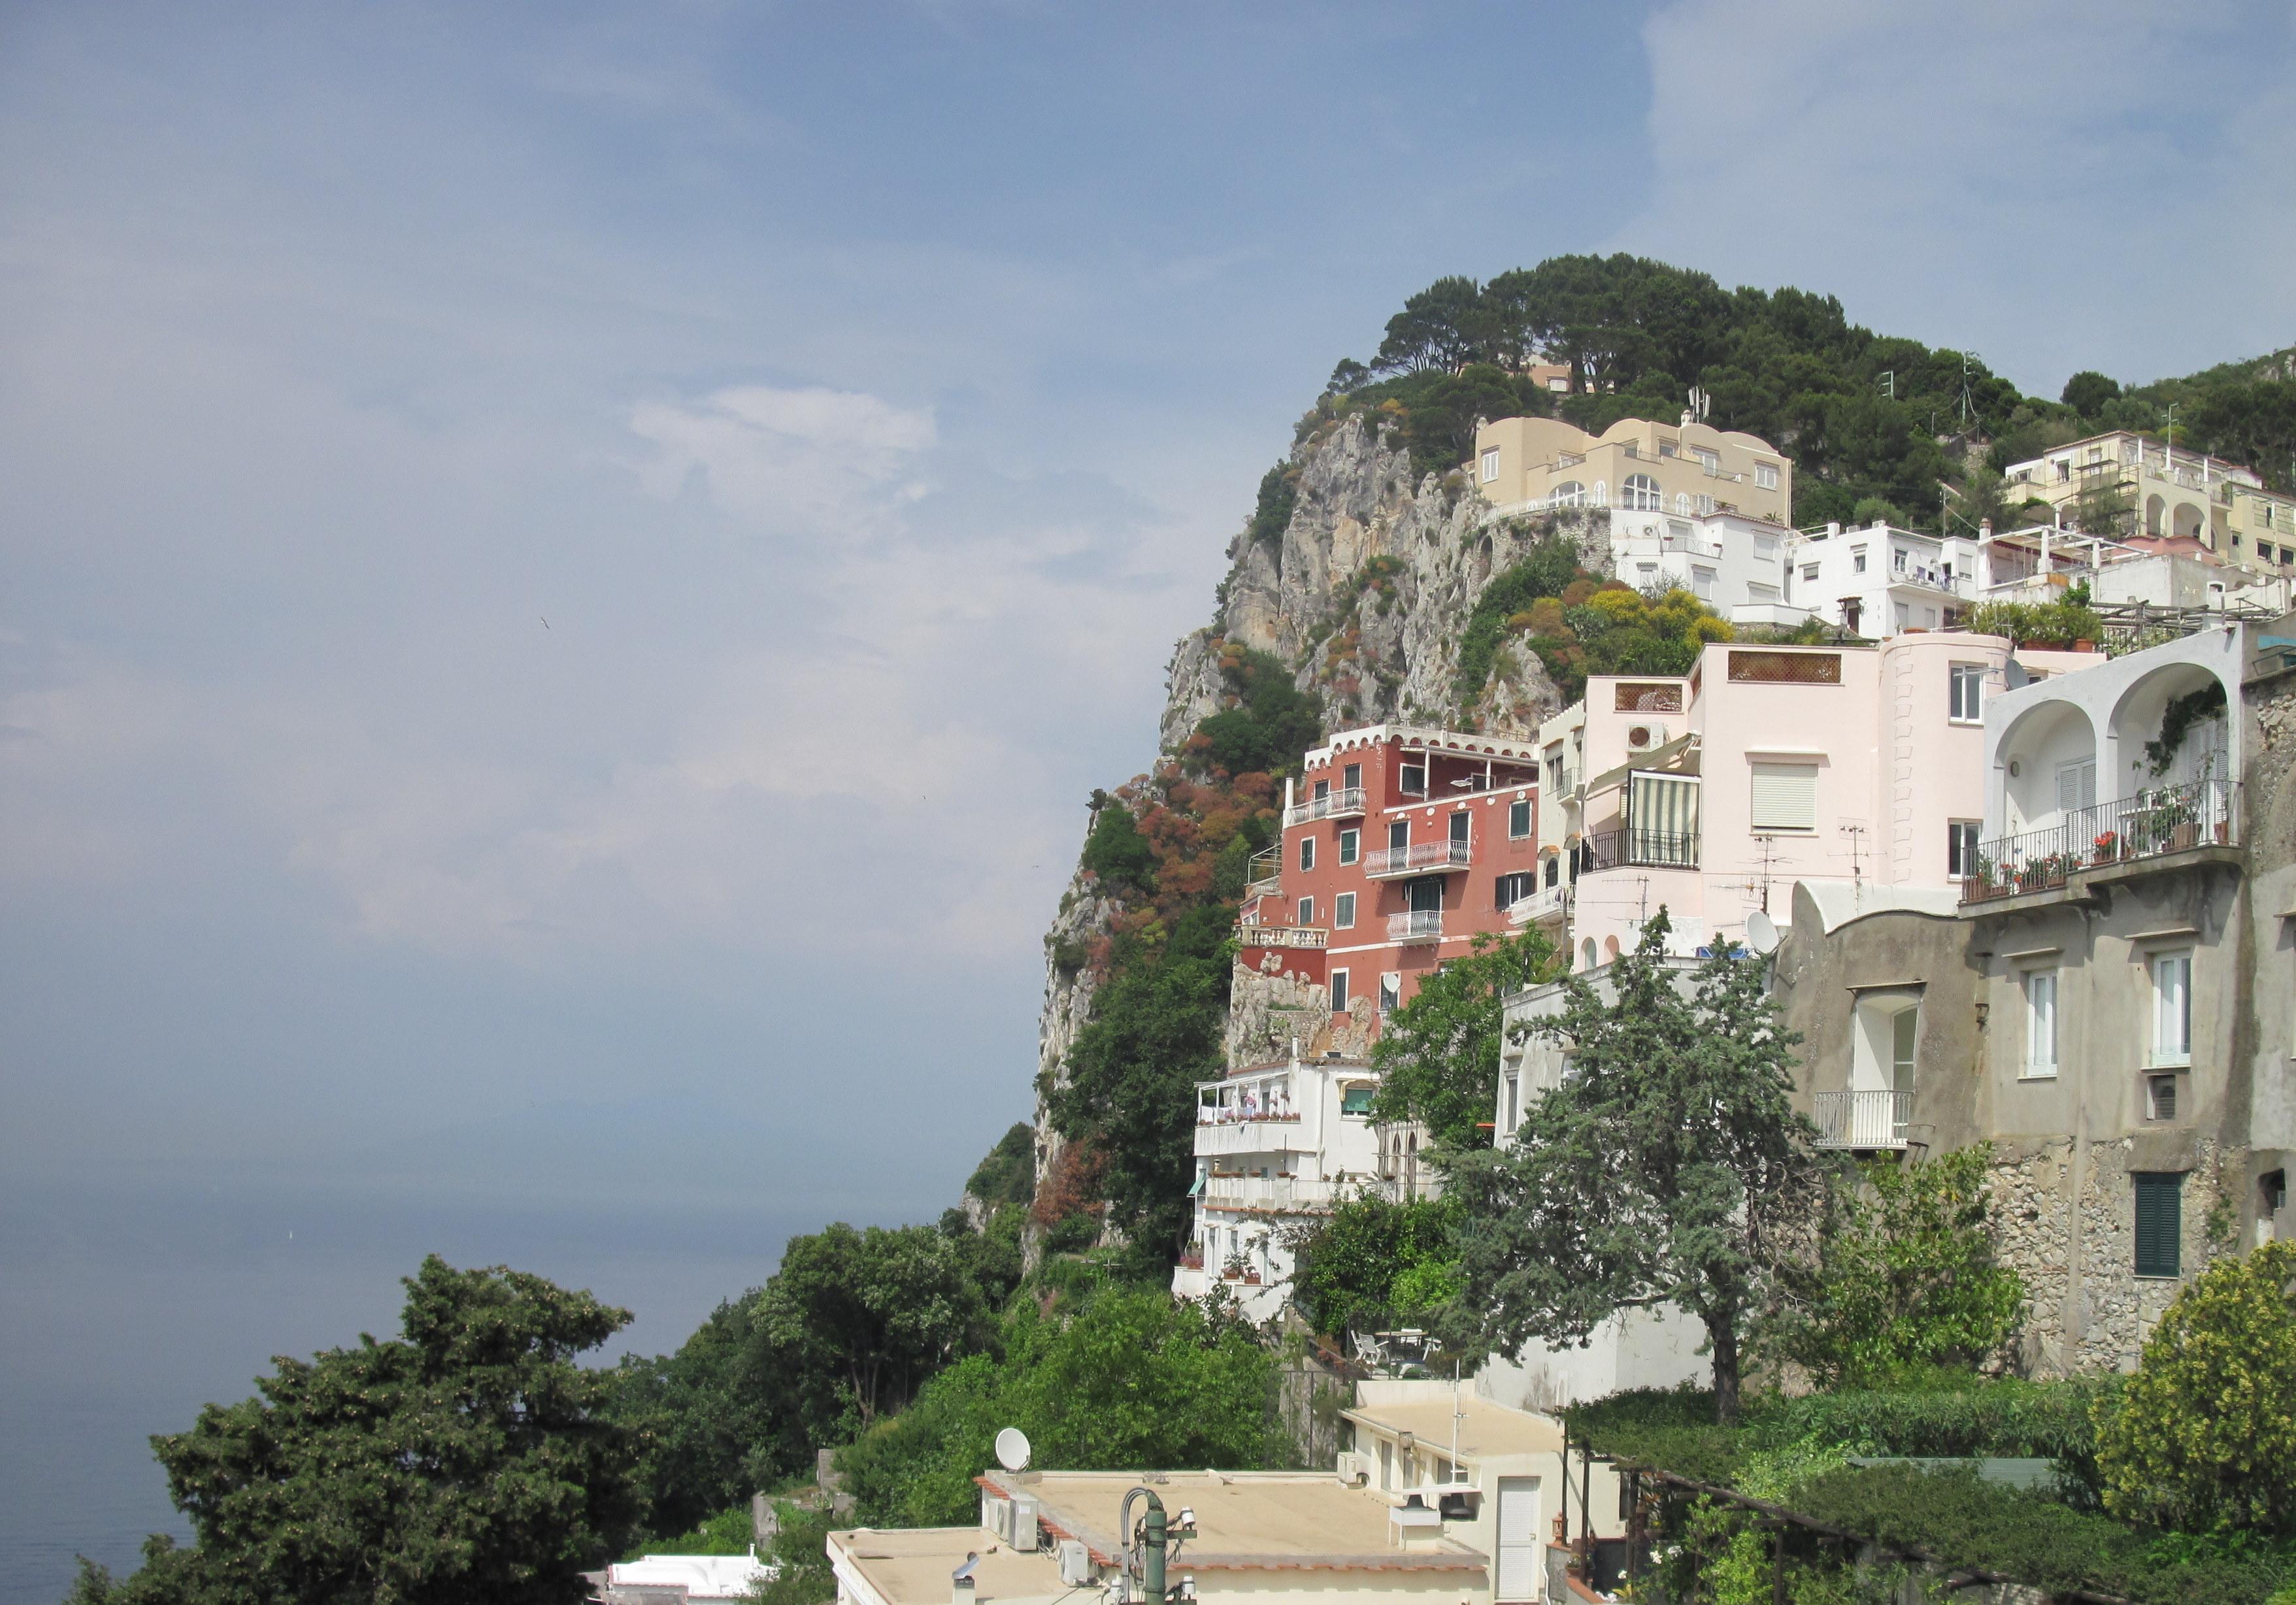 File:Villa Behring on Capri.jpg - Wikimedia Commons